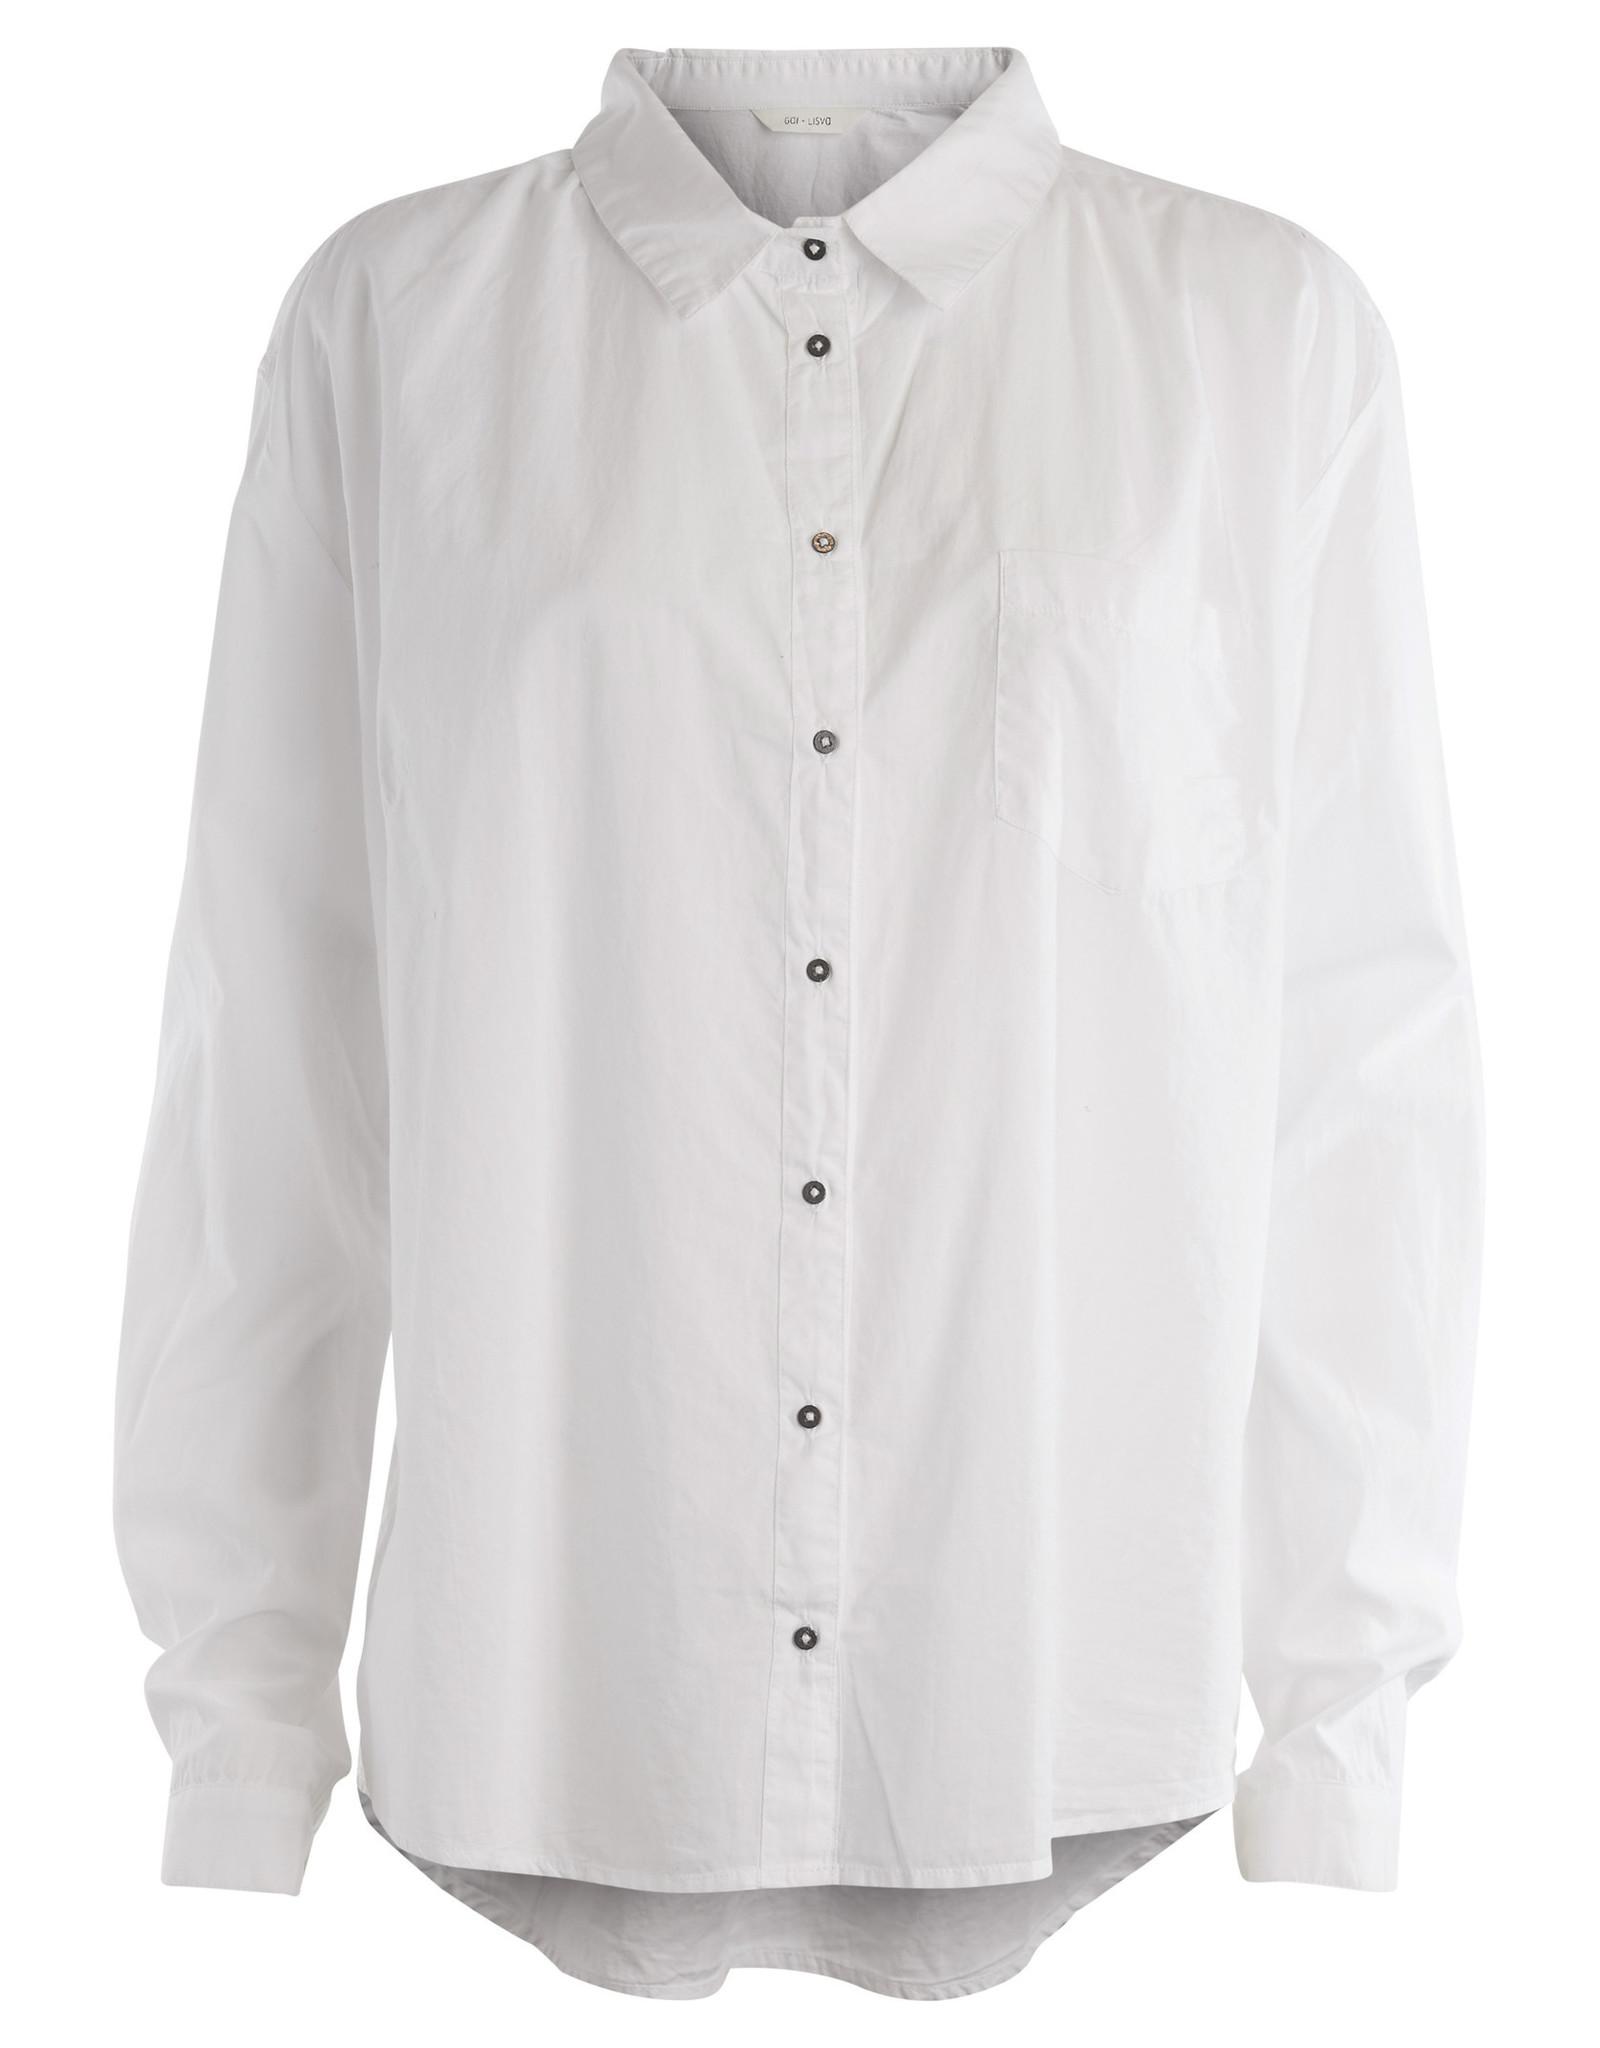 Gai & Lisva Shanta - 100% Organic Cotton Oversize Shirt